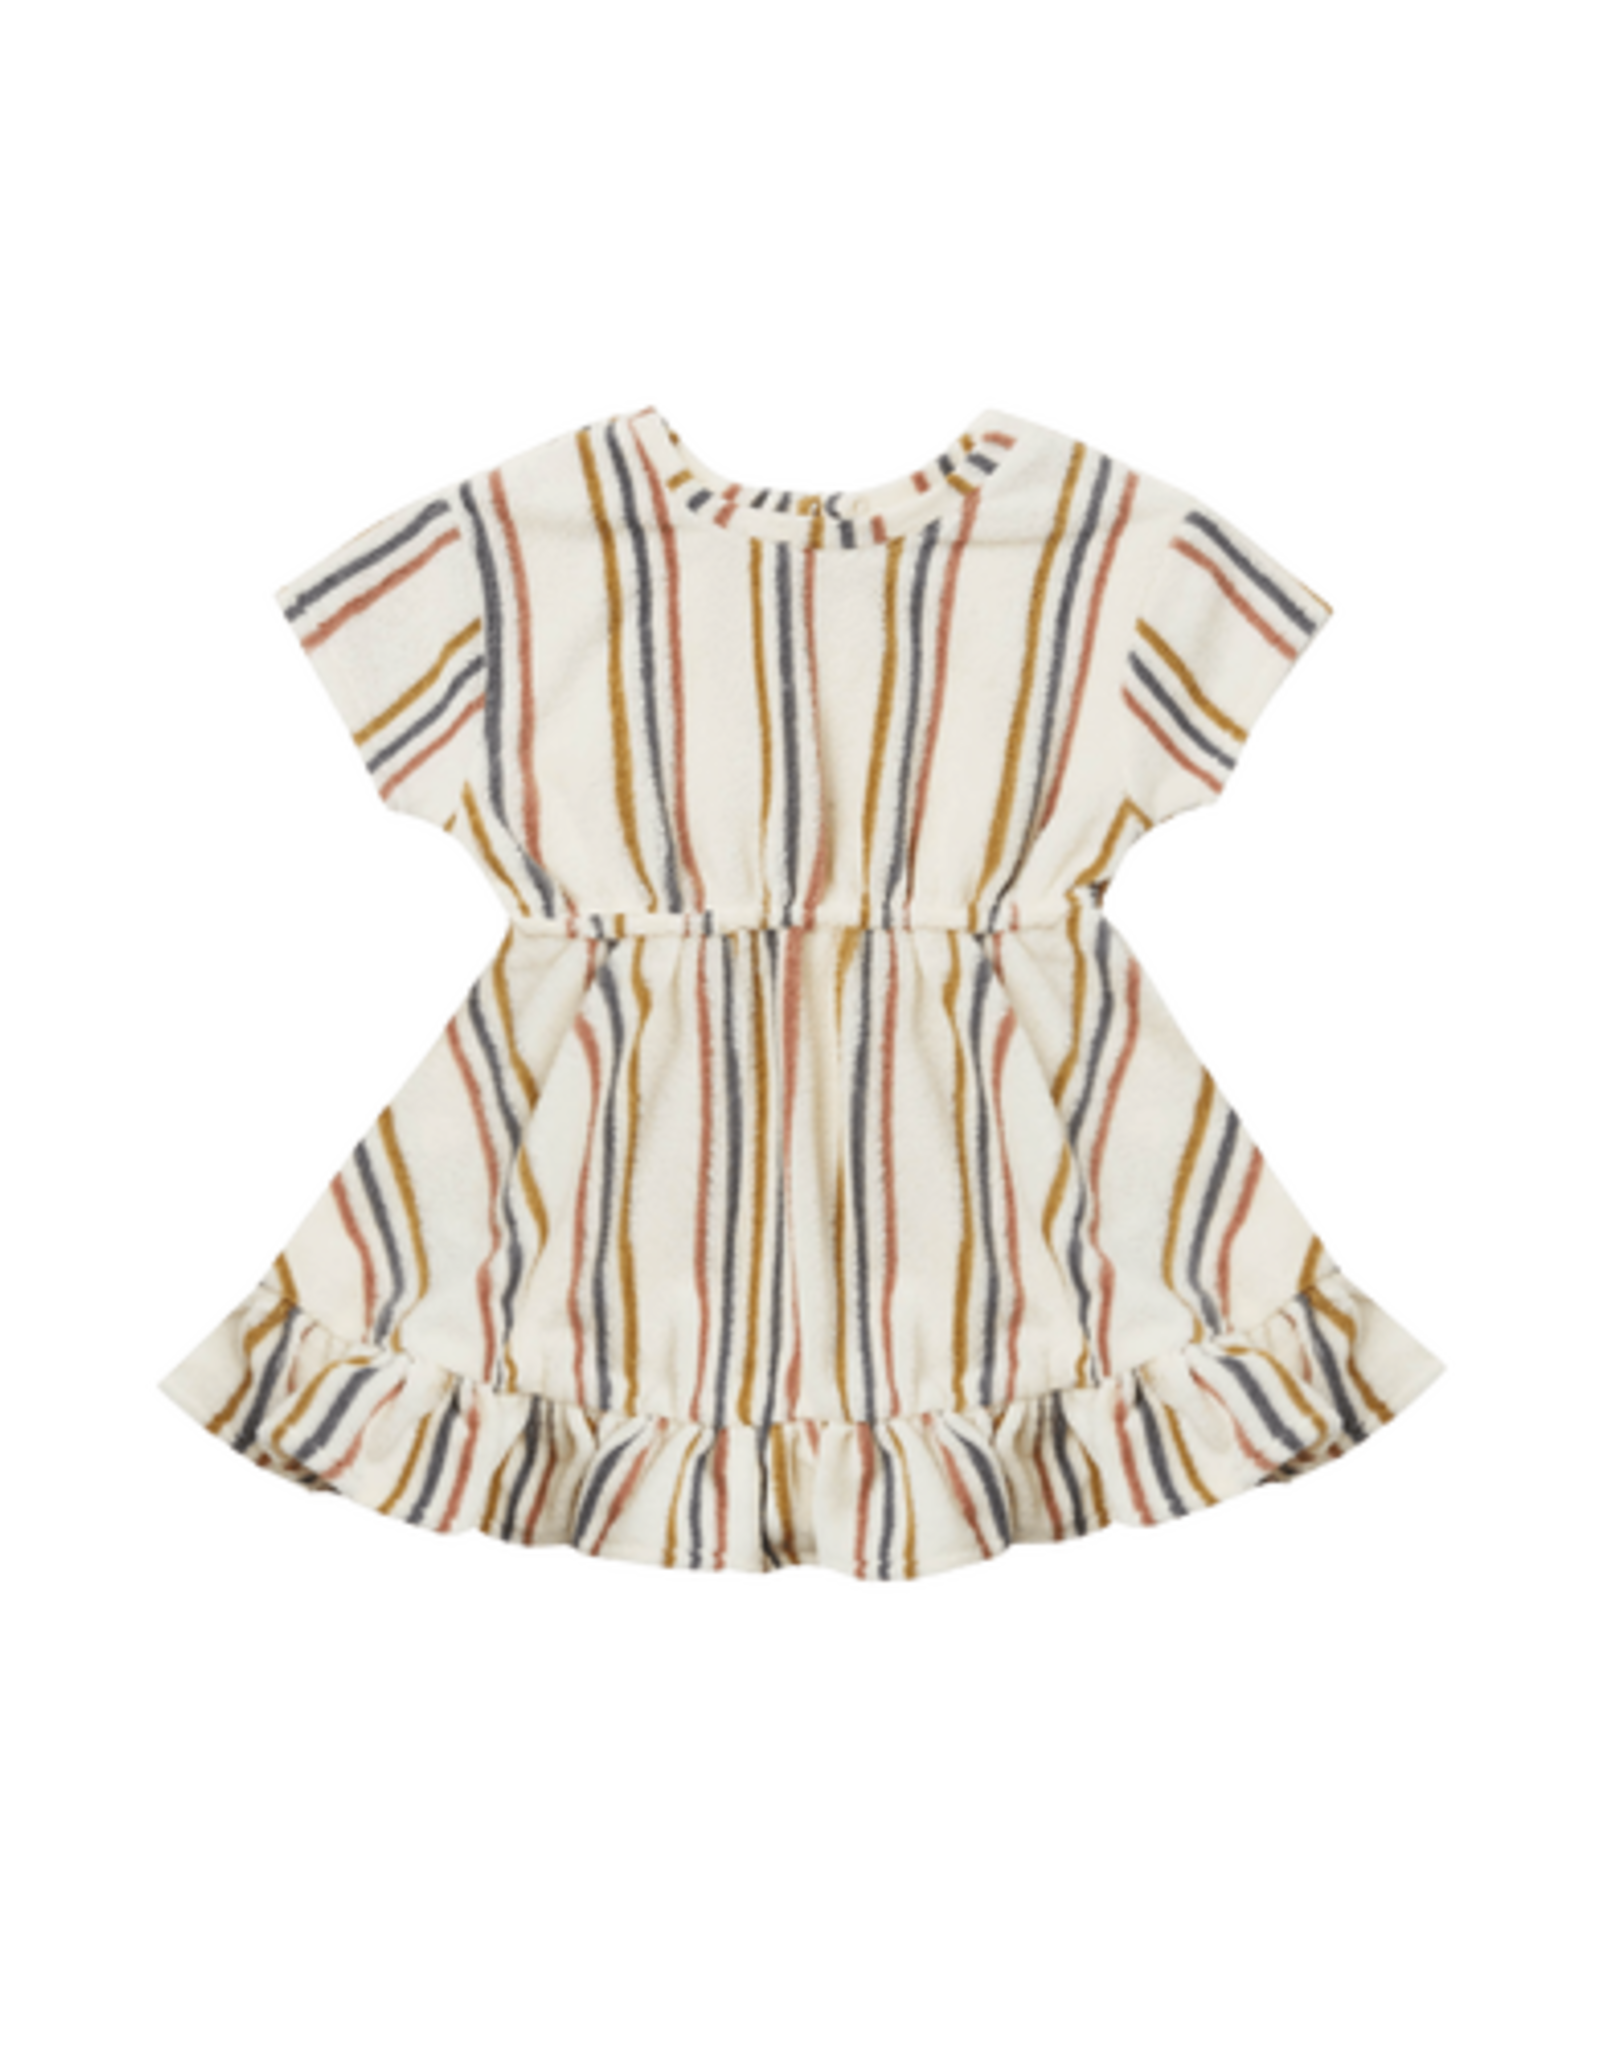 Quincy Mae Quincy Mae Terry Dress Retro Stripe